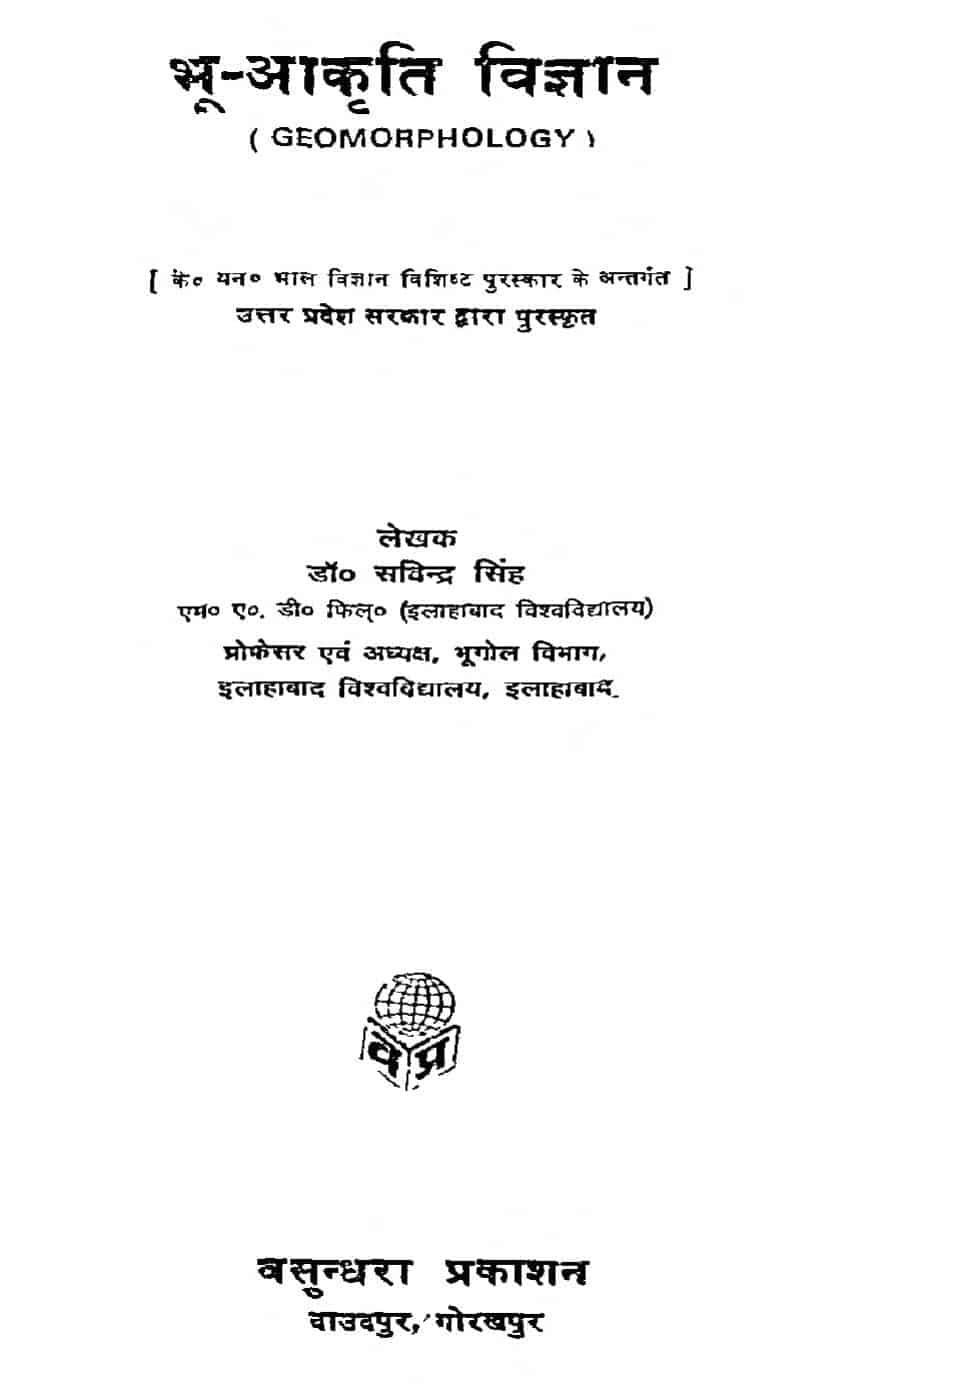 Book Image : भू - आकृति विज्ञान - Geomorphology